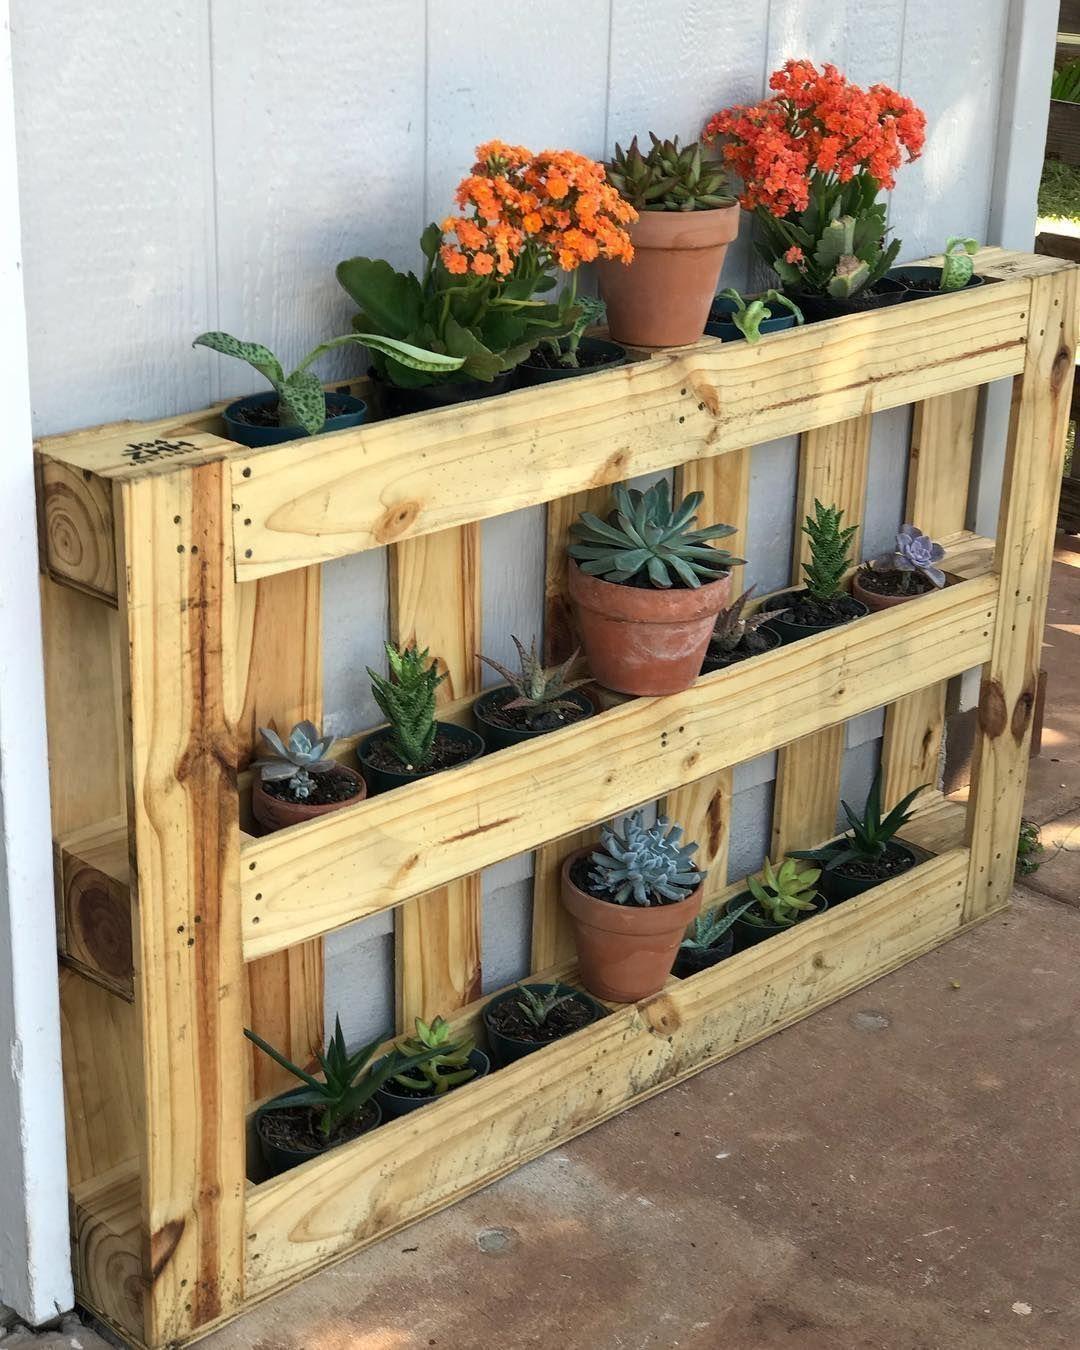 Diy Wooden Pallet Project Ideas